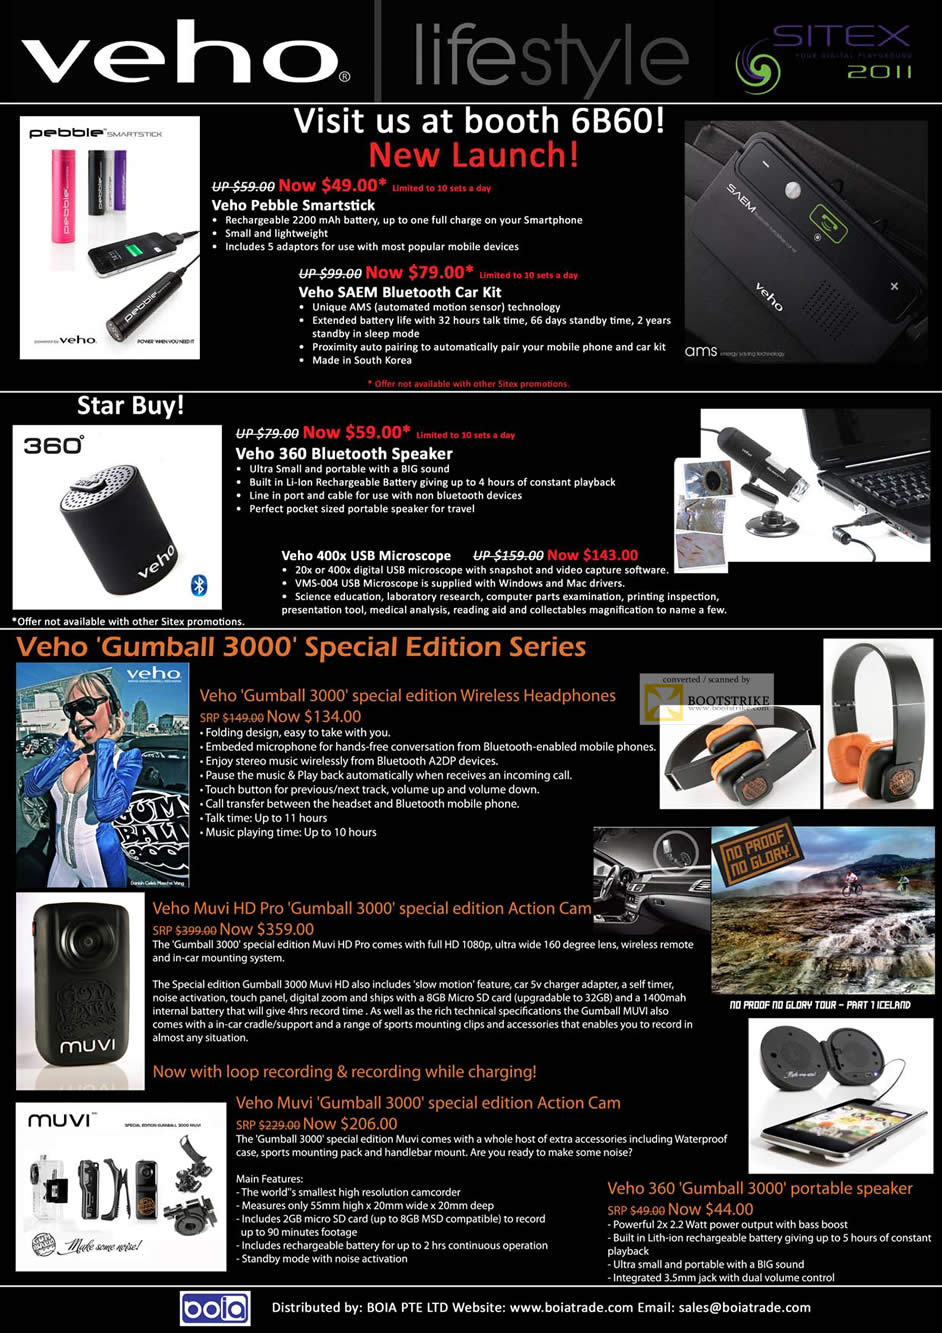 SITEX 2011 price list image brochure of Cresyn Veho Pebble Smartstick Battery, Saem Bluetooth, 360 Bluetooth Speaker, USB Microscope, Gumball 3000 Headphones, Muvi HD Pro, Muvi Gumball 3000 Camcorder, 360 Portable Speaker